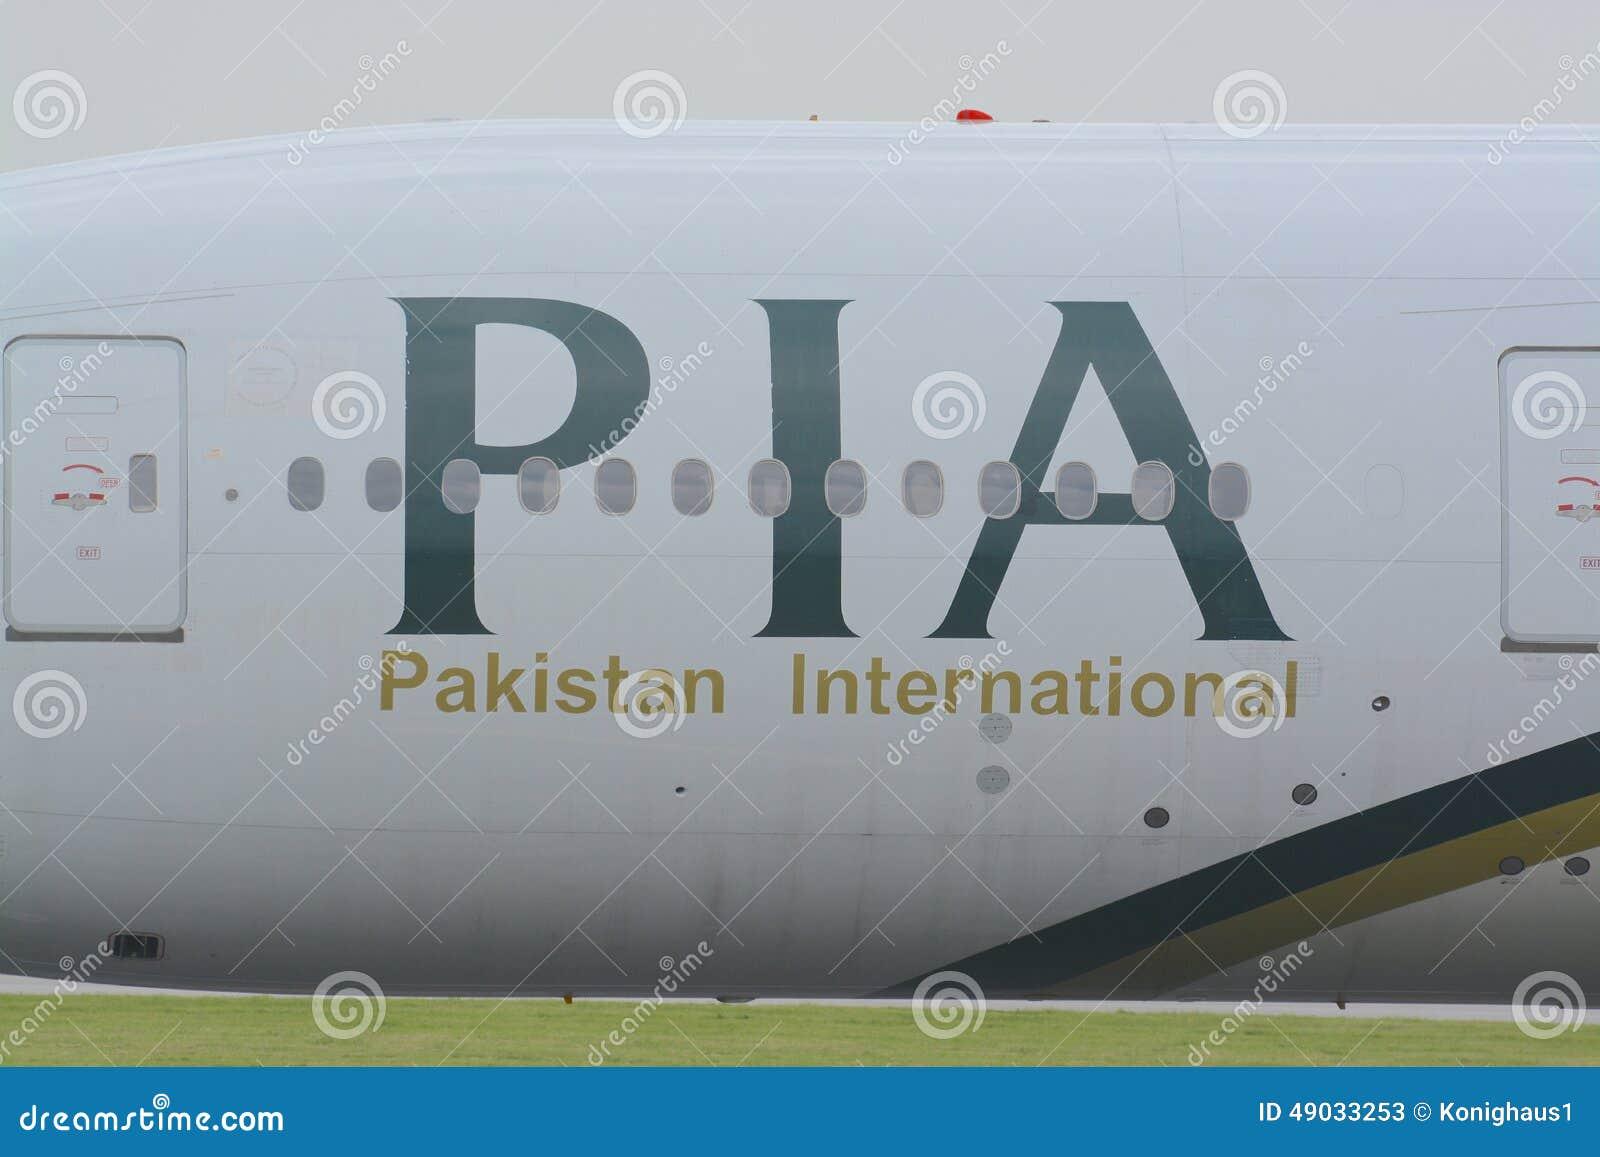 Bakery business plan in pakistan aeroplane